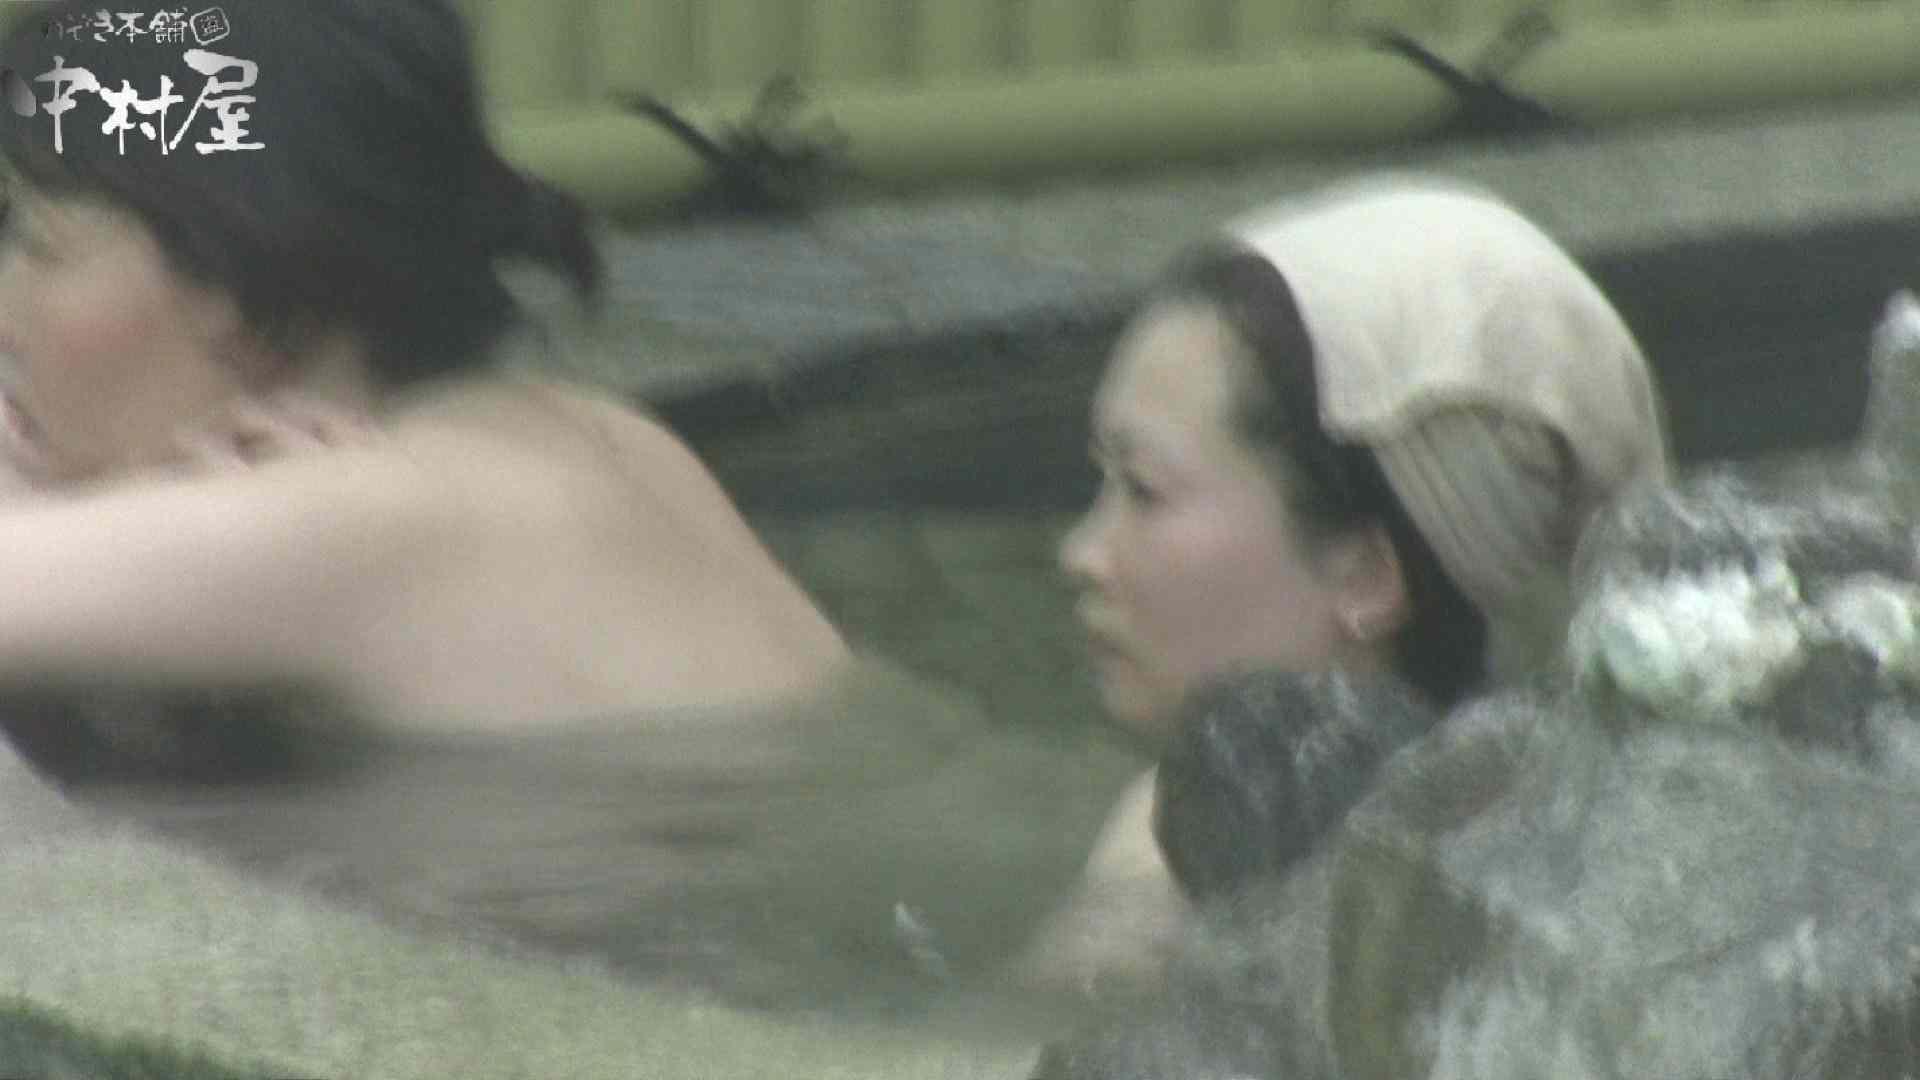 Aquaな露天風呂Vol.906 OLセックス 盗撮オマンコ無修正動画無料 92画像 77